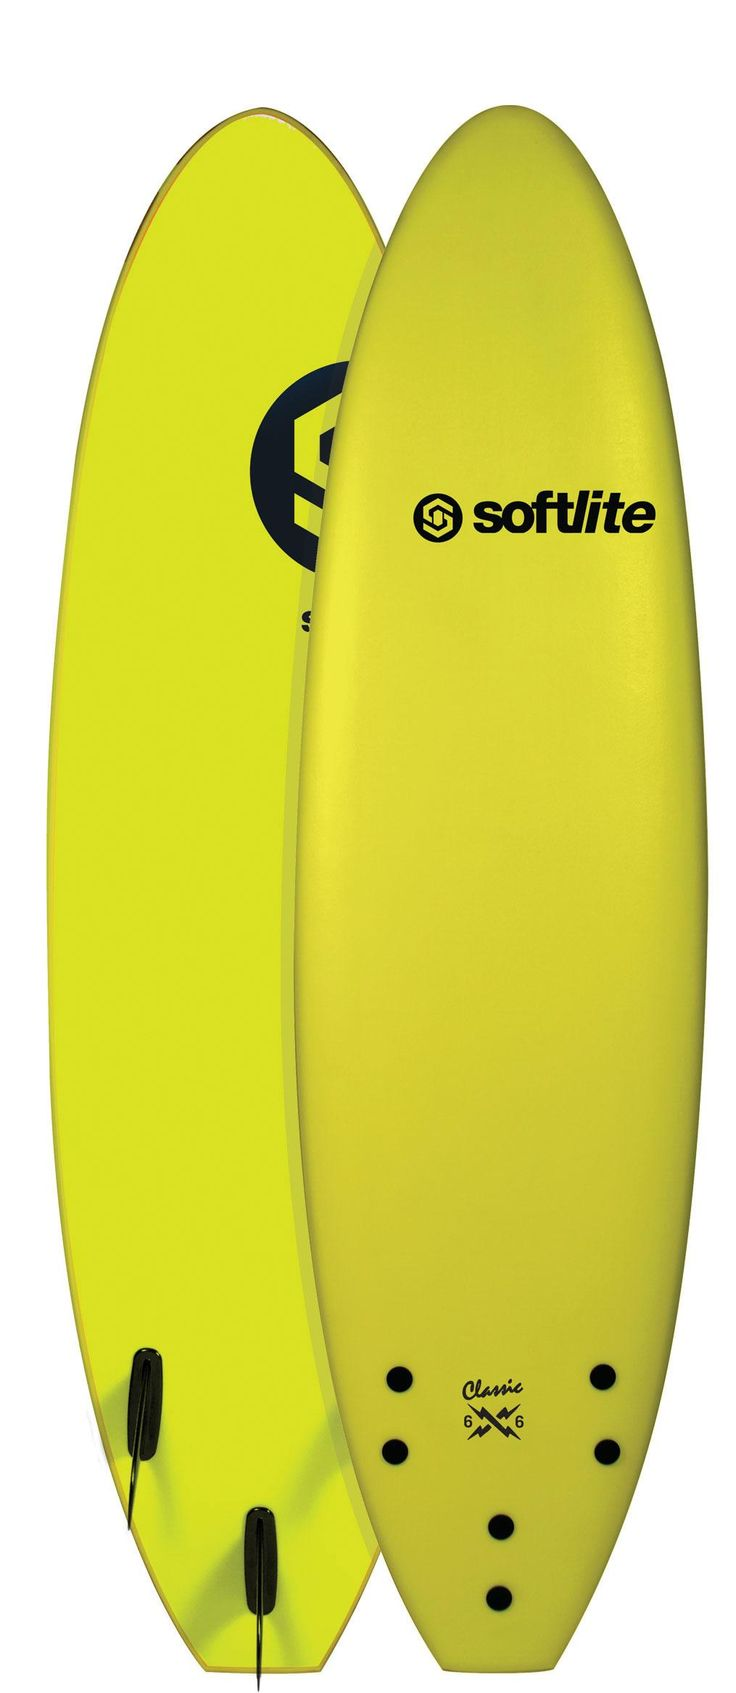 SOFTLITE SURFBOARD Classic Series 6'6 Shortboard Your Local Bodyboard Shop - Australia & Worldwide